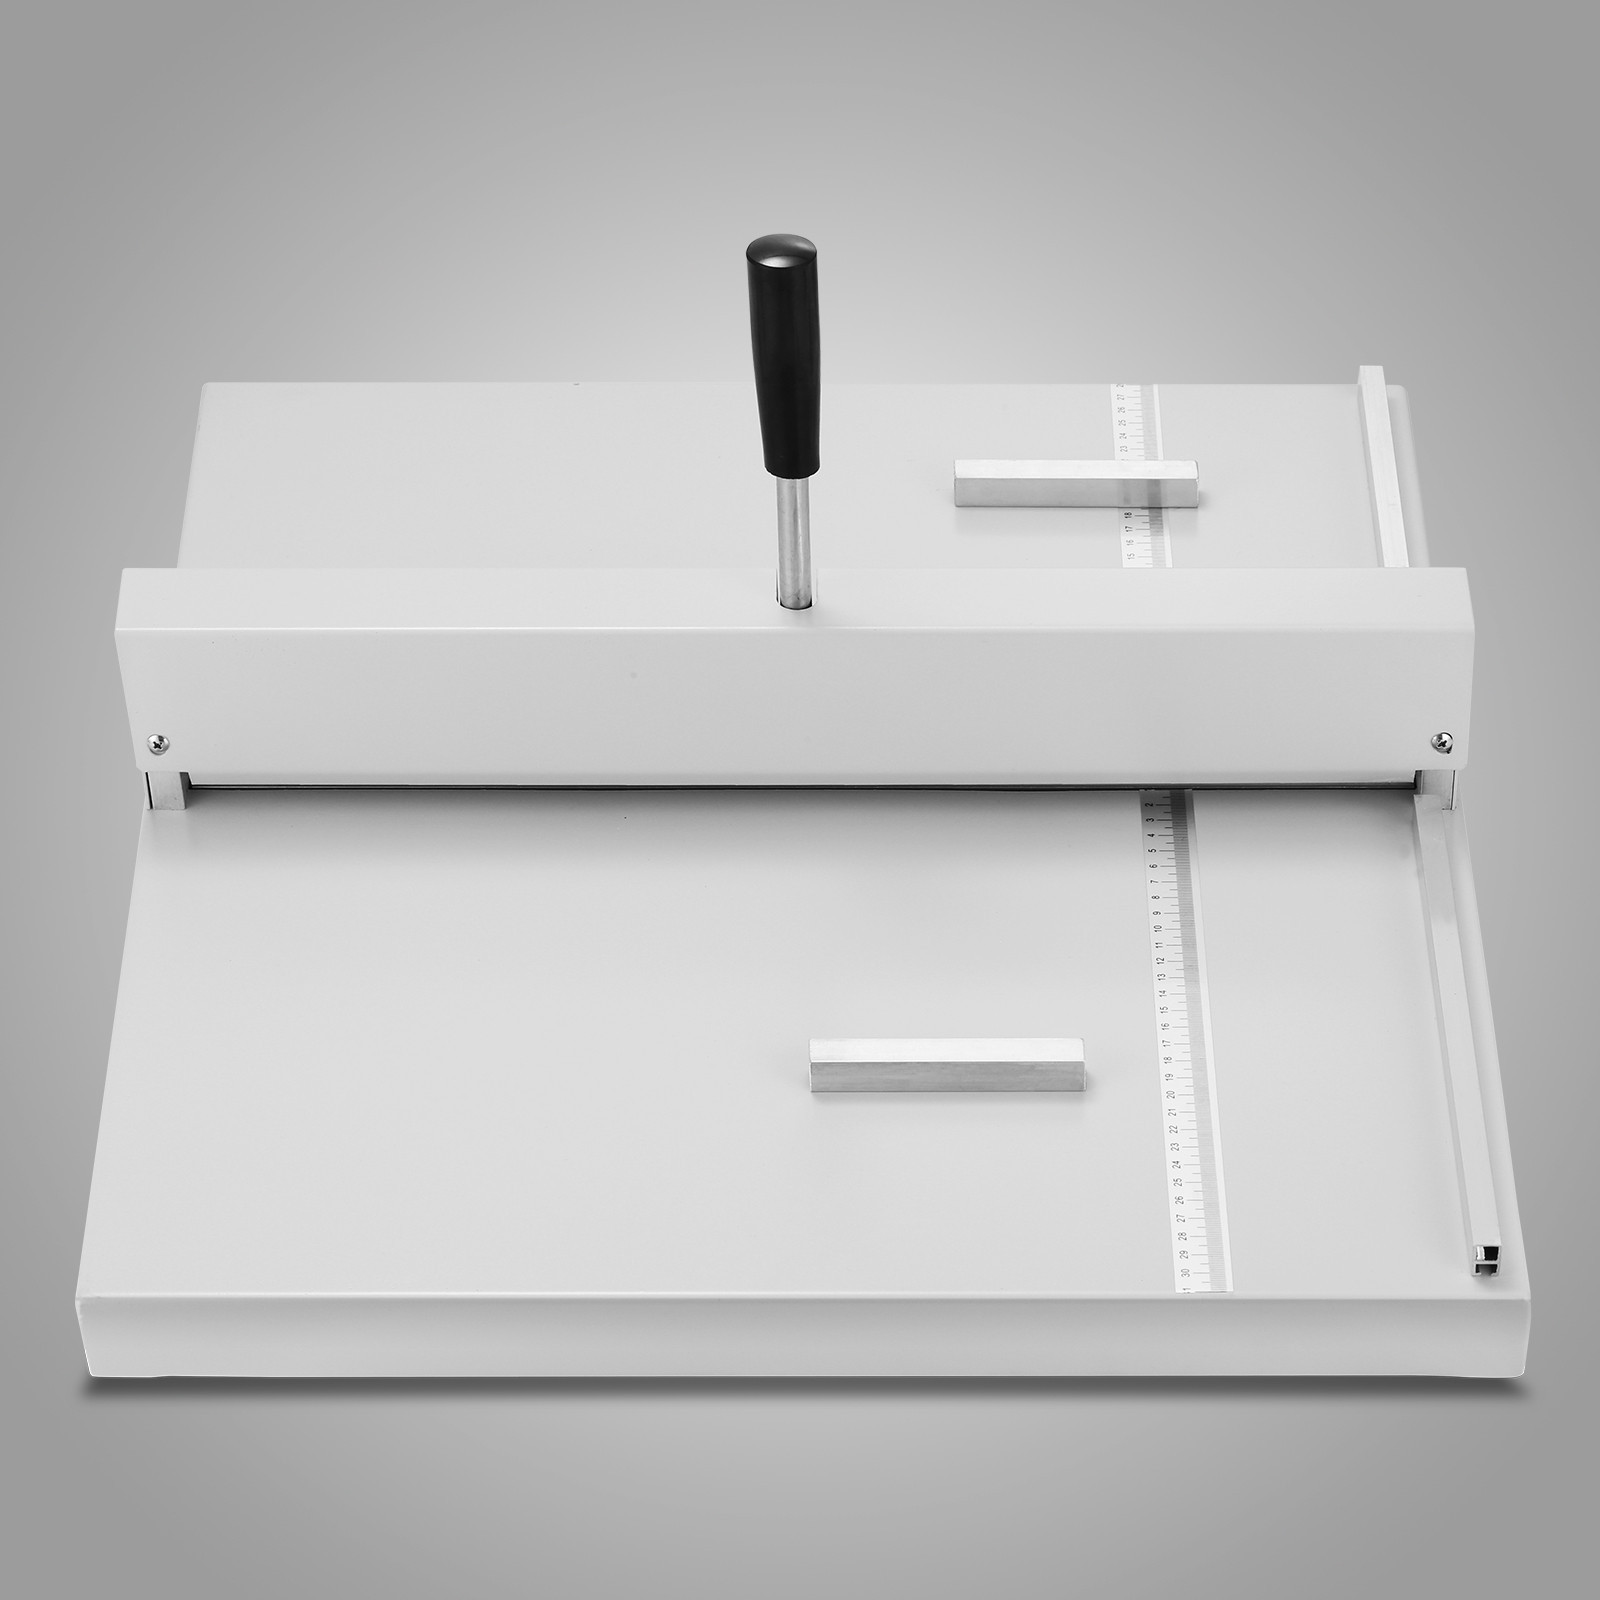 Cordonatrice-Perforatrice-Max-350-520mm-Profondita-Regolabile-Elettrica-Manuale miniatura 40